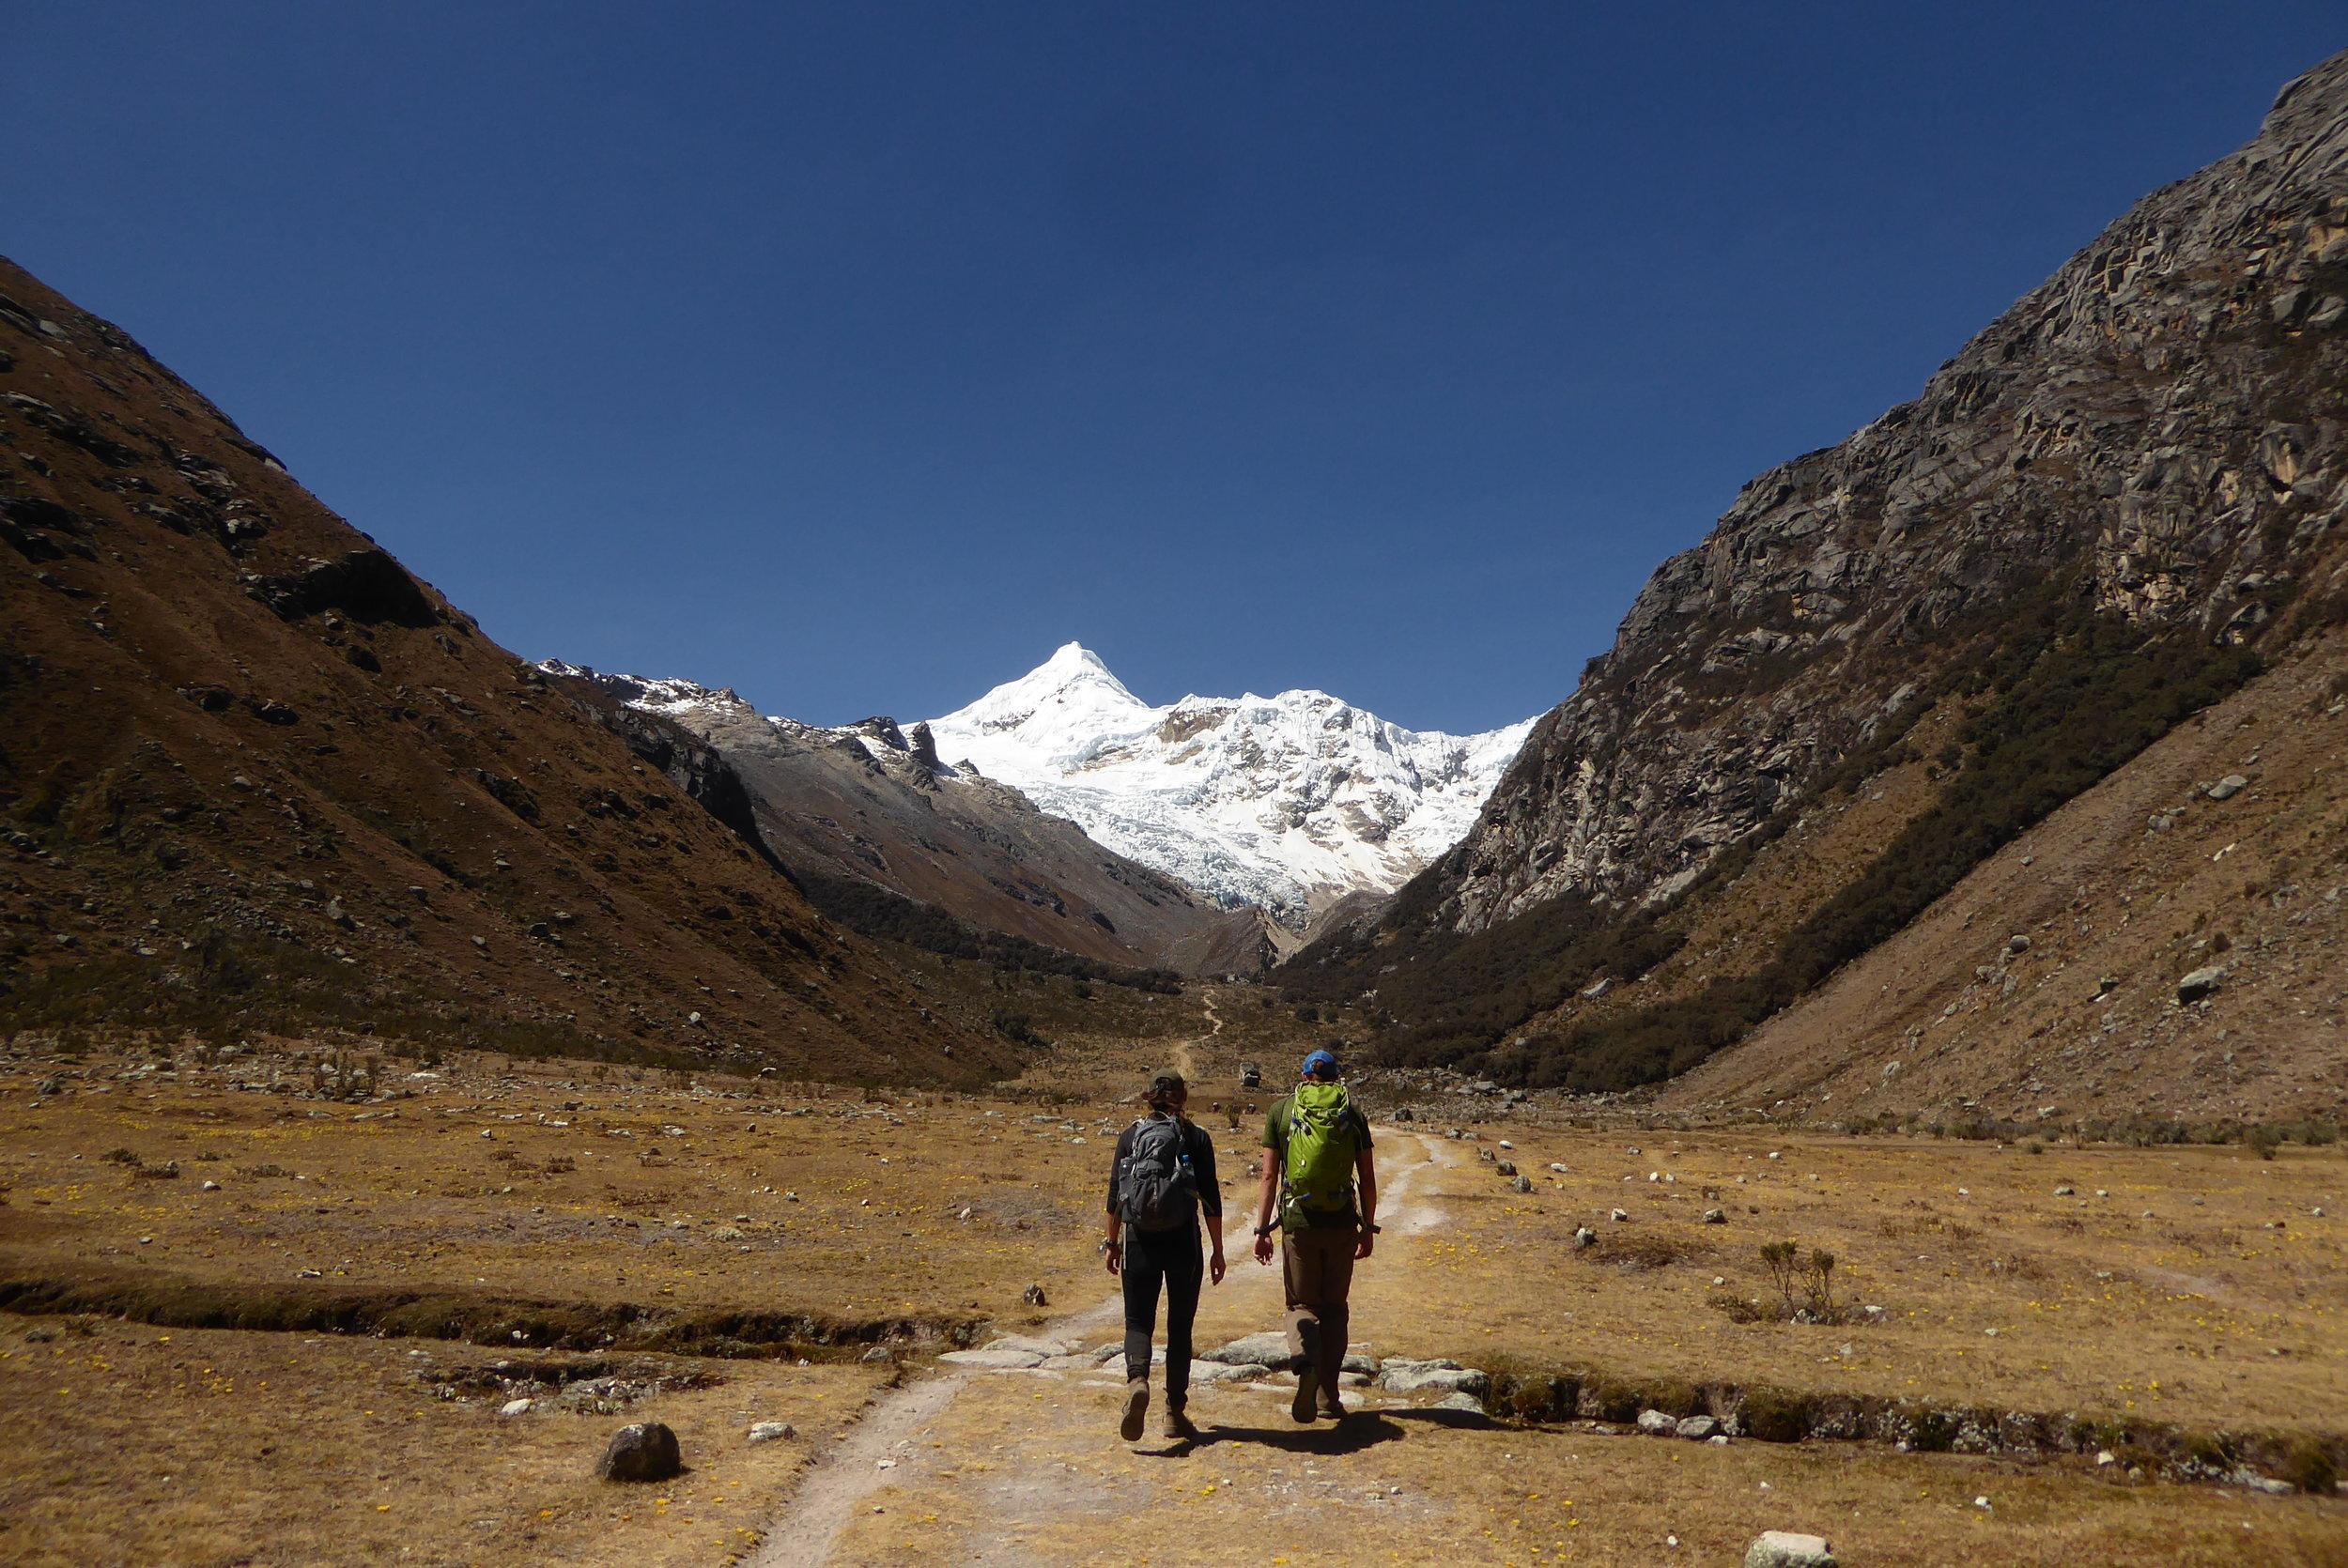 Peru Expedtion   Trek through the Cordillera Blanca